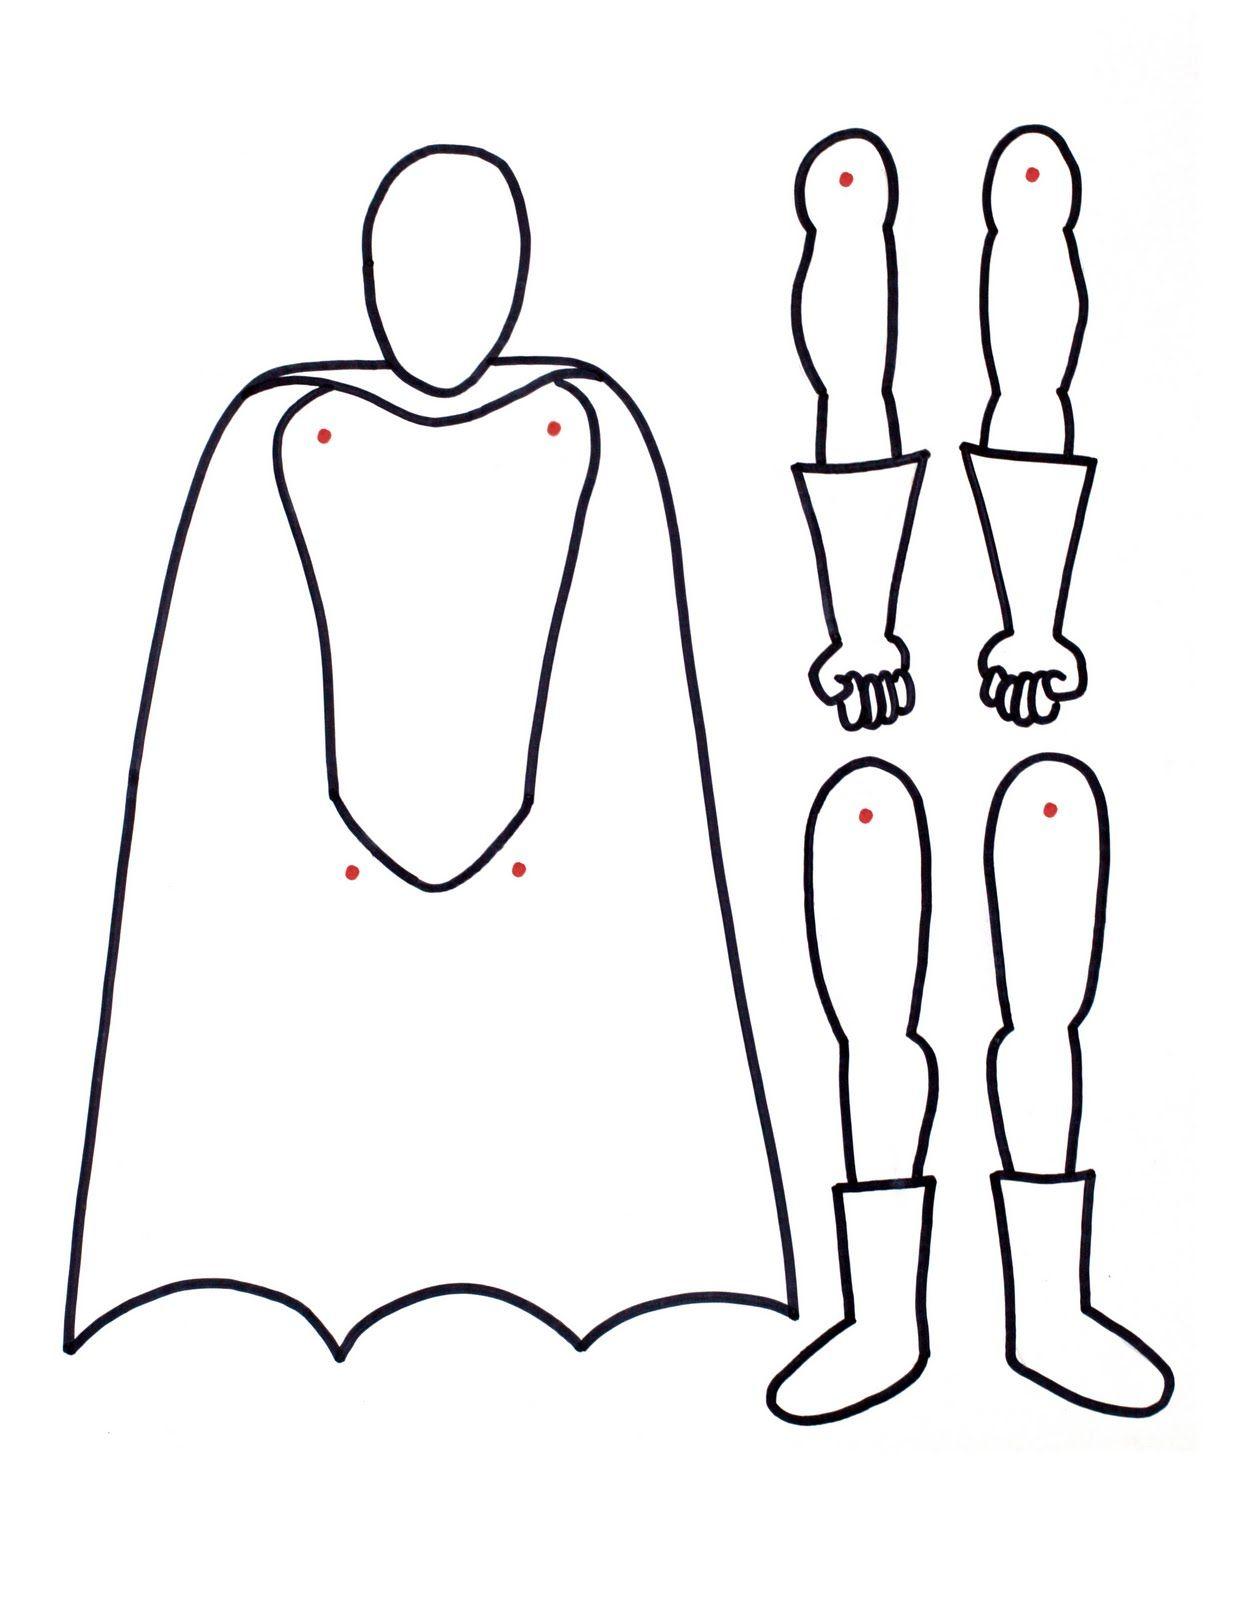 super hero costume templates coloring pages. Black Bedroom Furniture Sets. Home Design Ideas